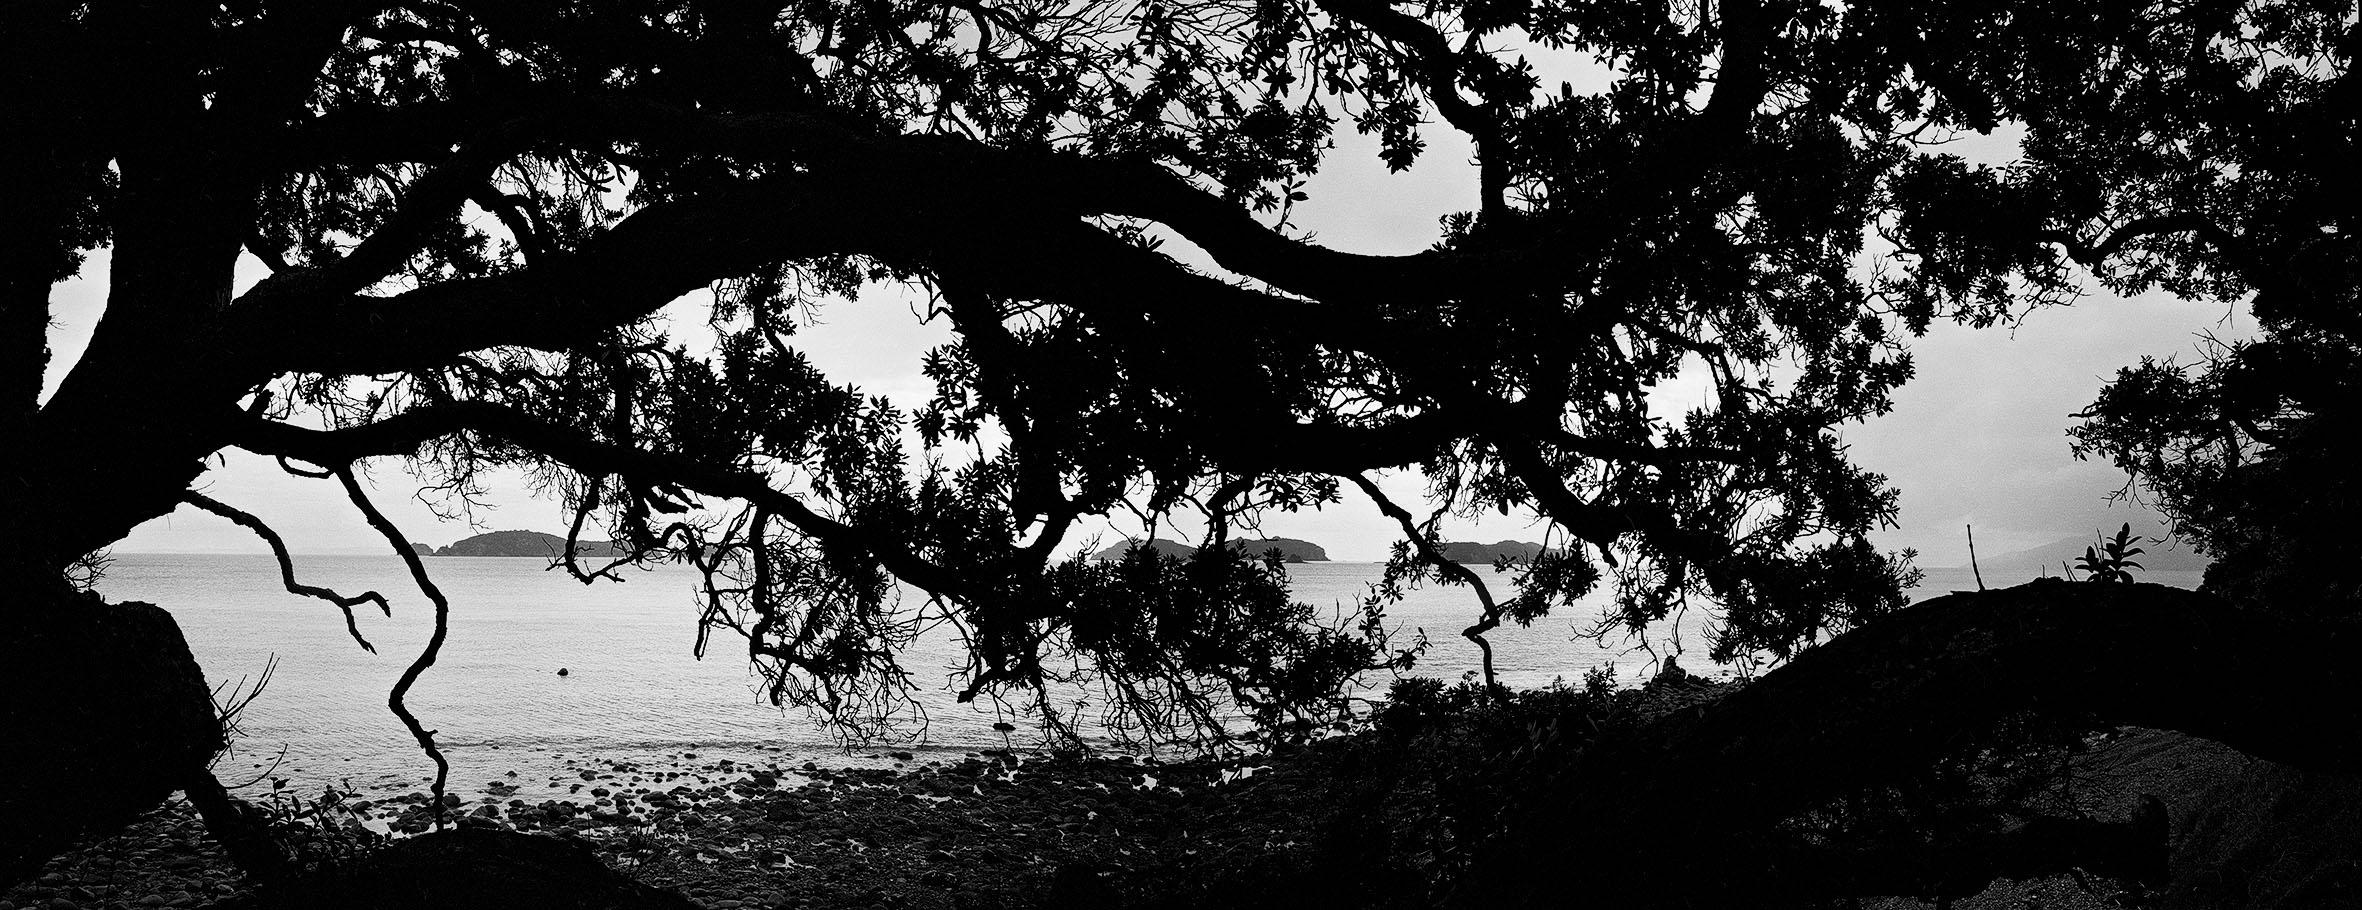 15 Tree Coromandel, NZ. 1994